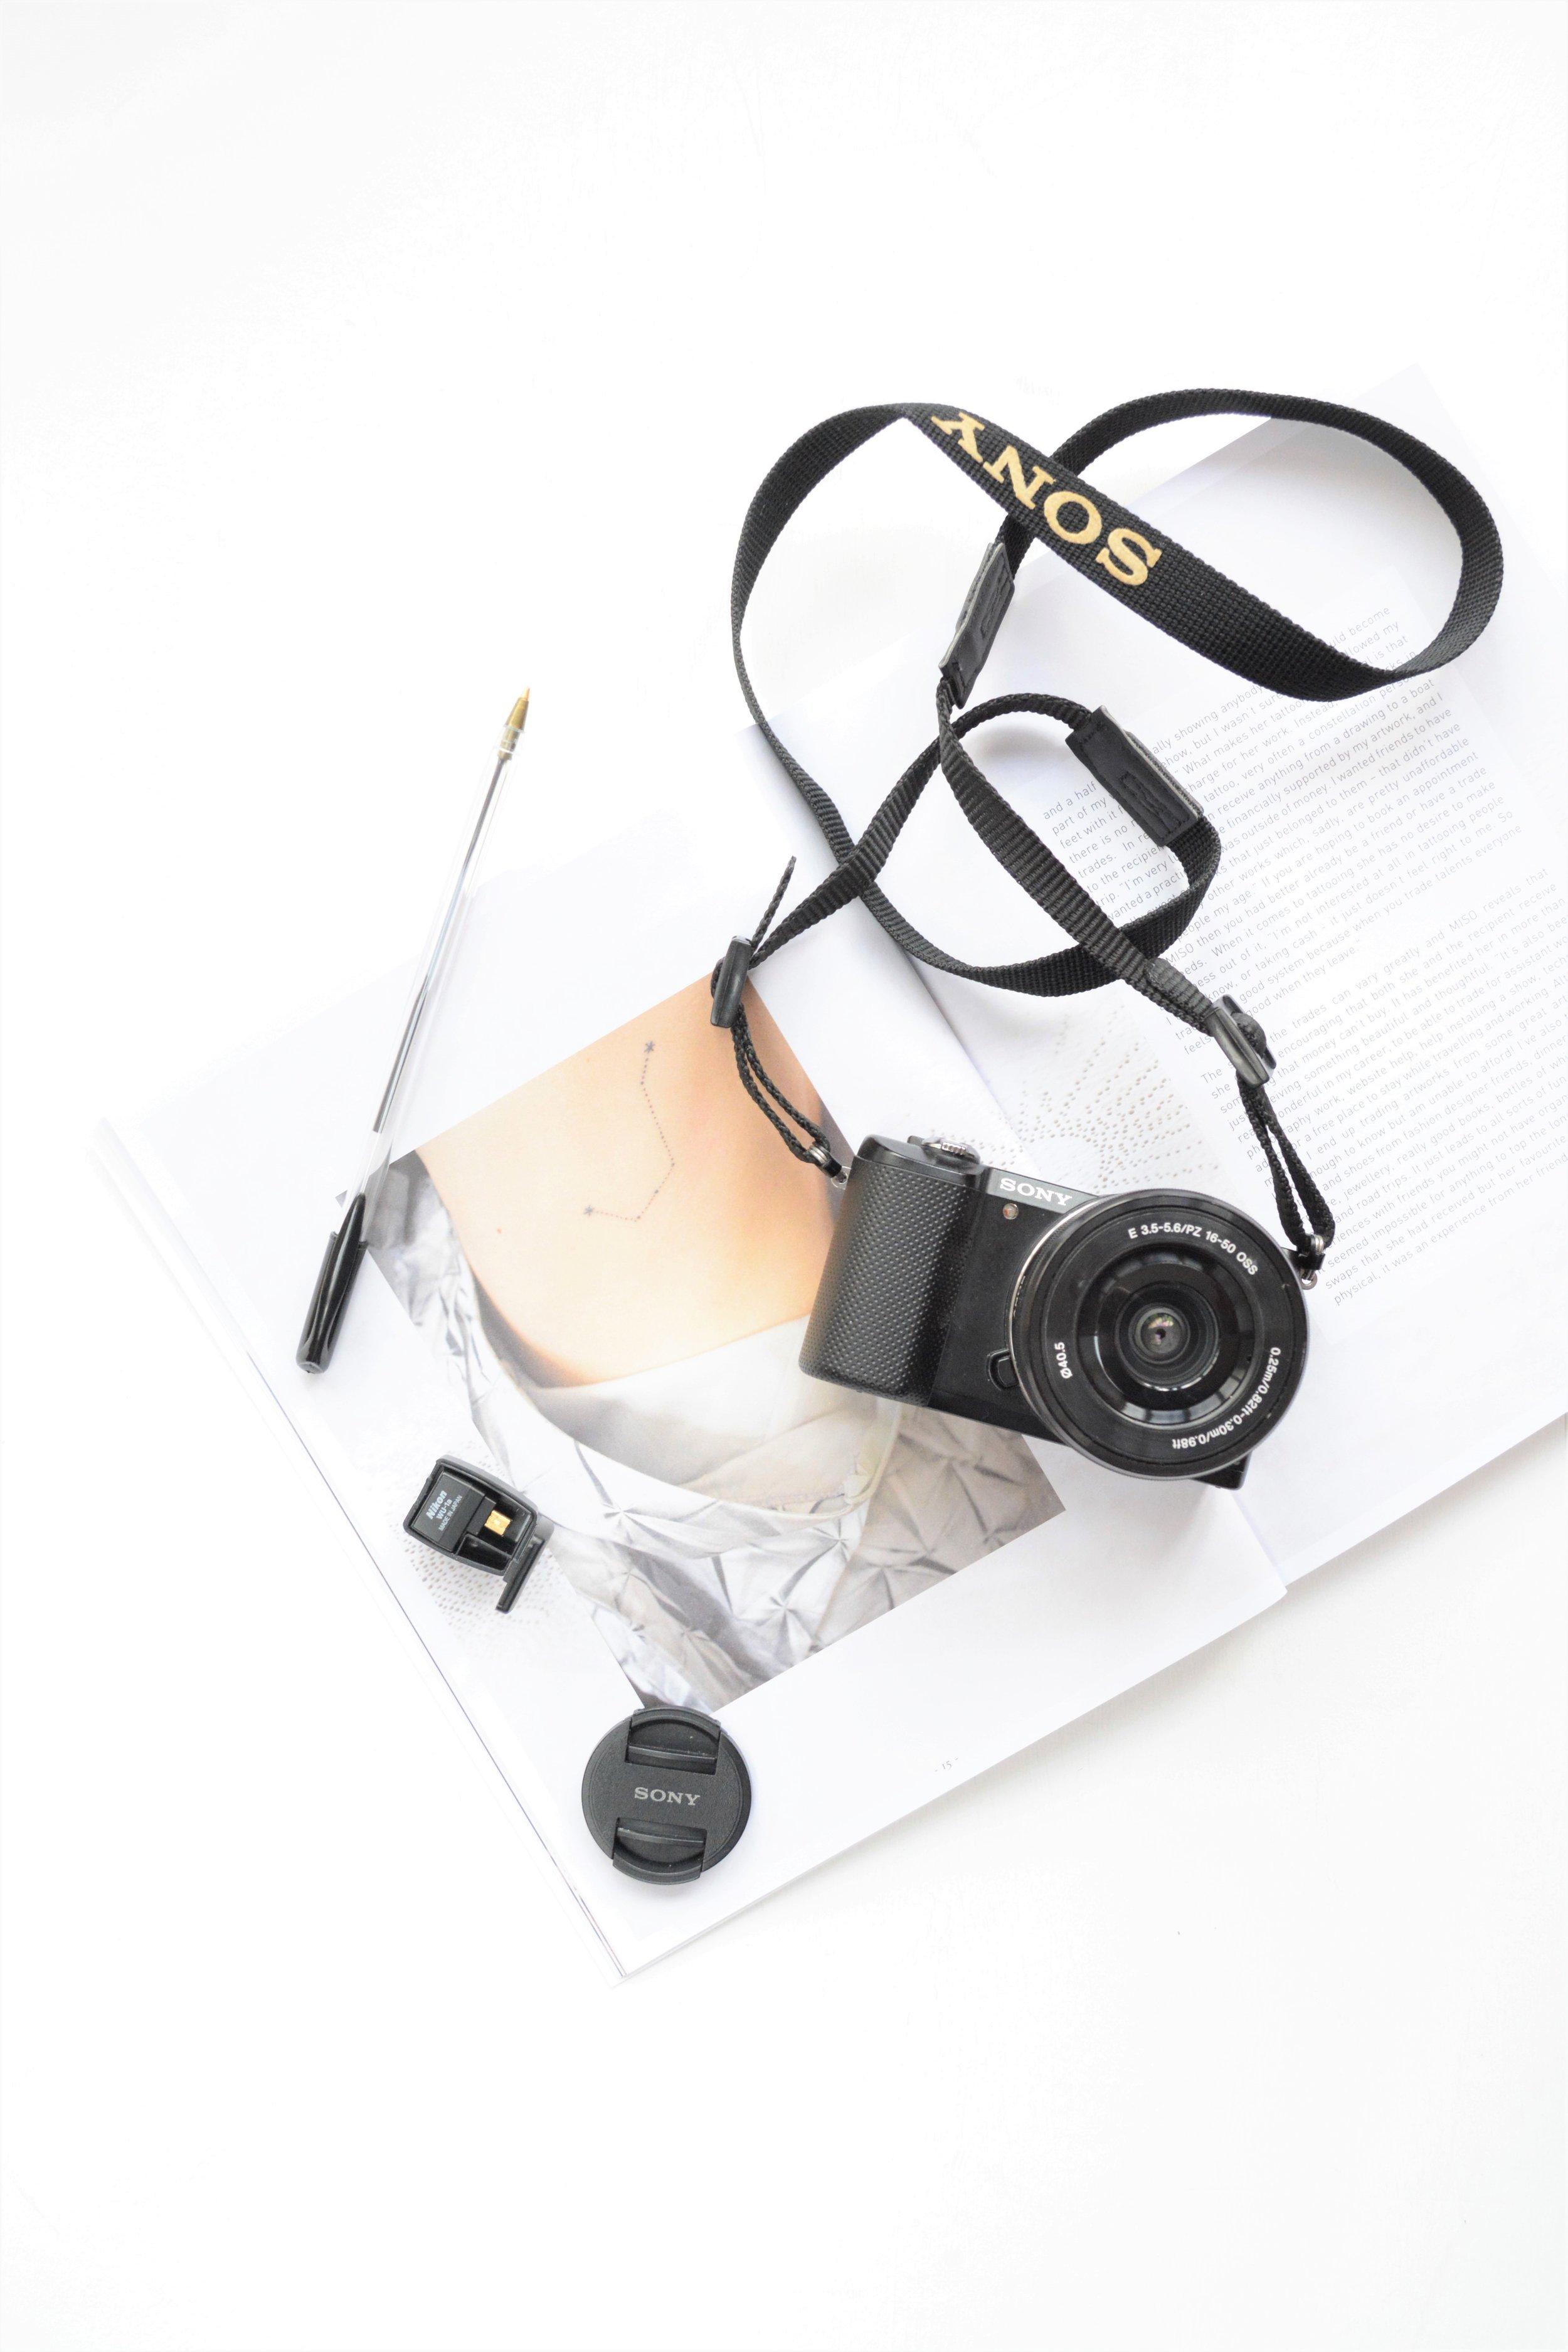 Exploring The Basics Of Photography.JPG